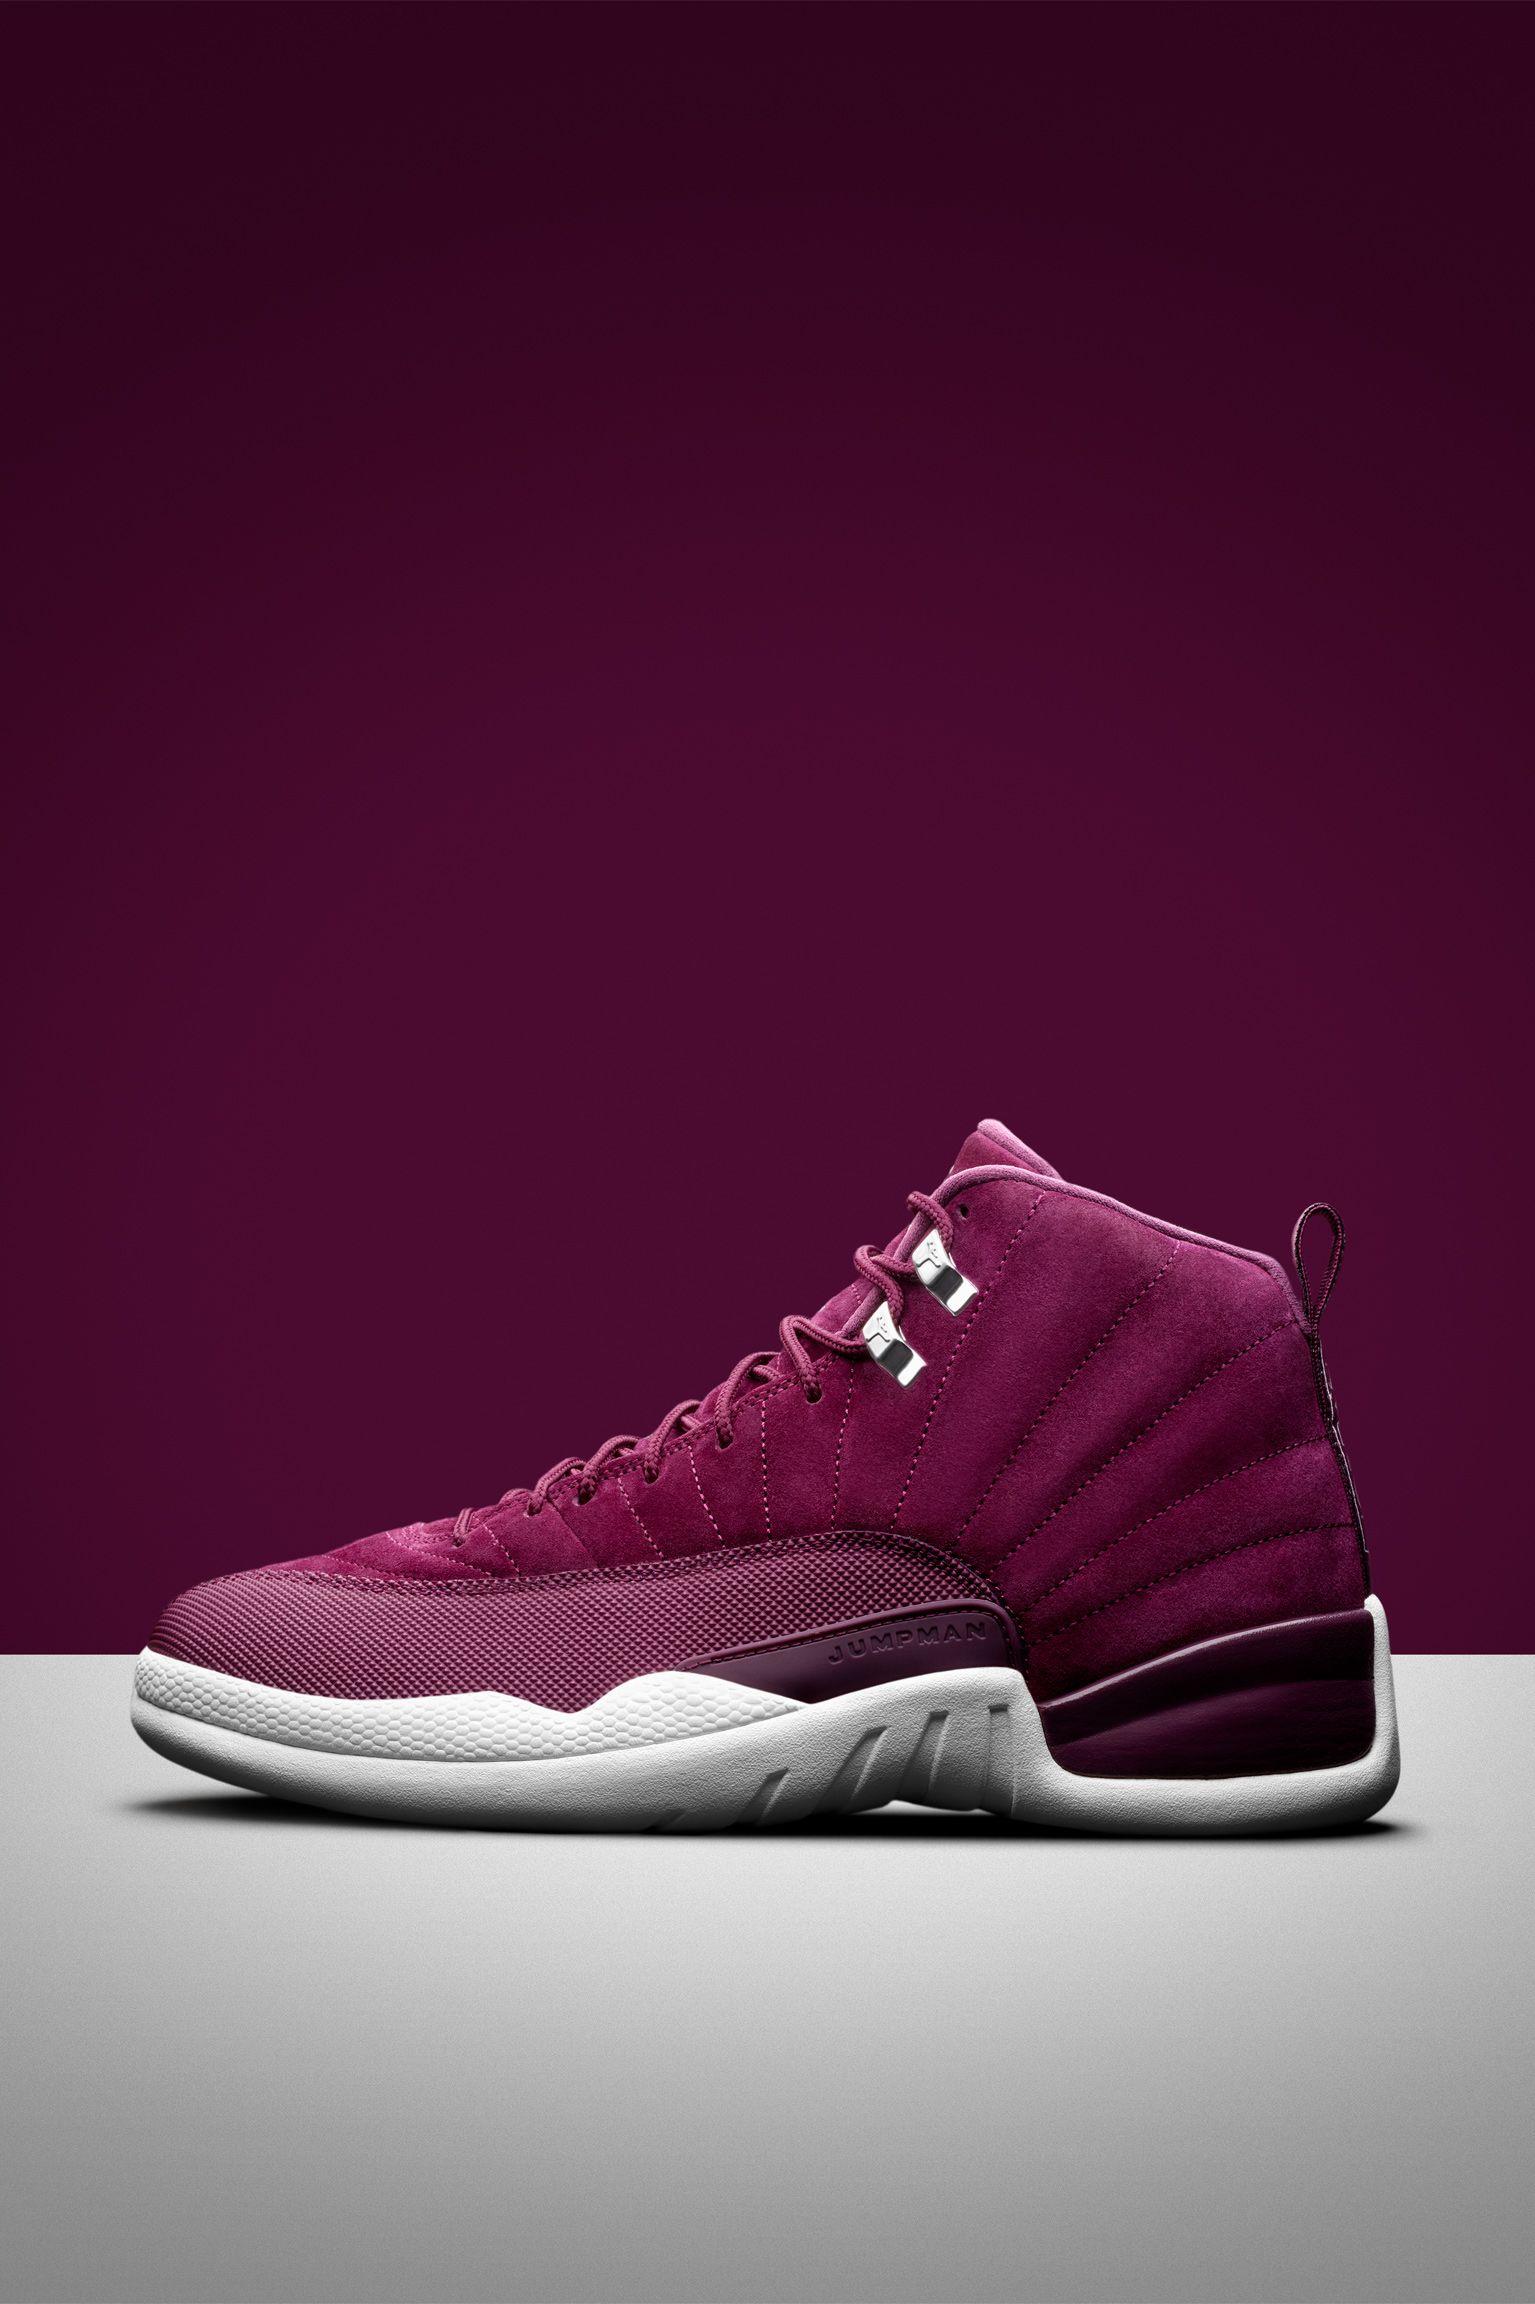 48461e3f1fc Air Jordan 12 Retro 'Bordeaux' Release Date. Nike+ SNKRS